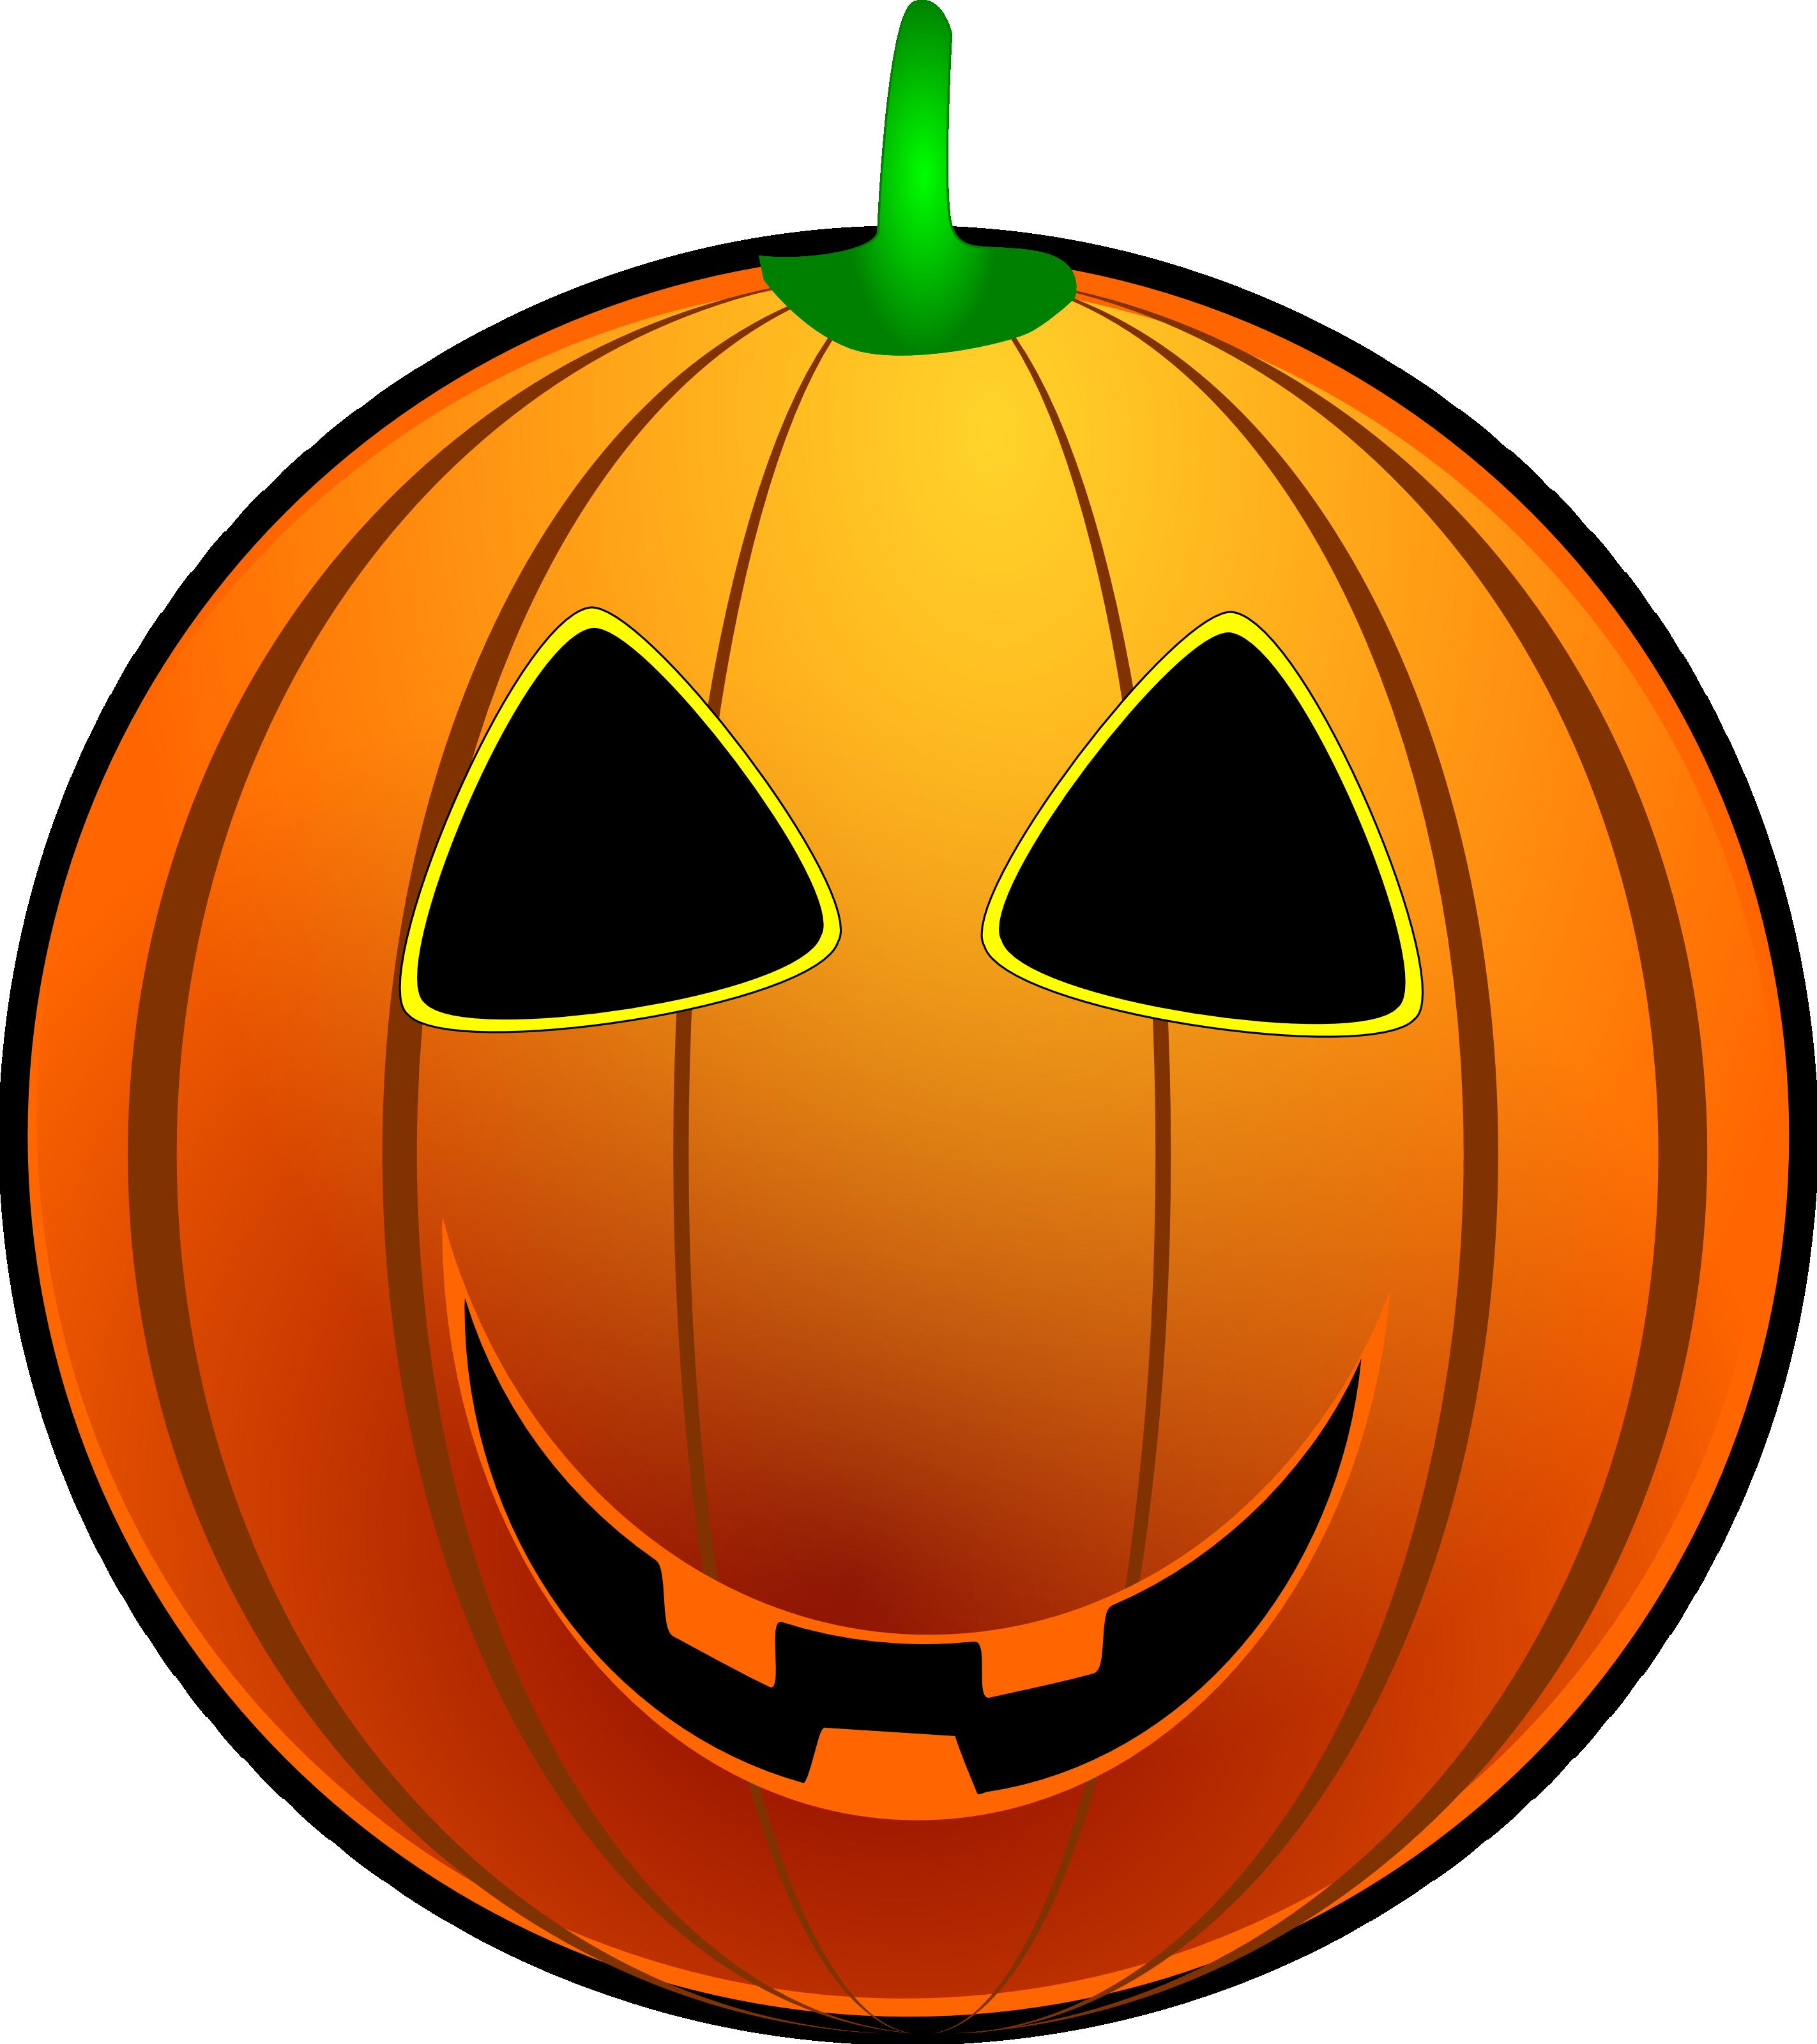 Grinning Jackolantern - Free Halloween Vector Clipart ...